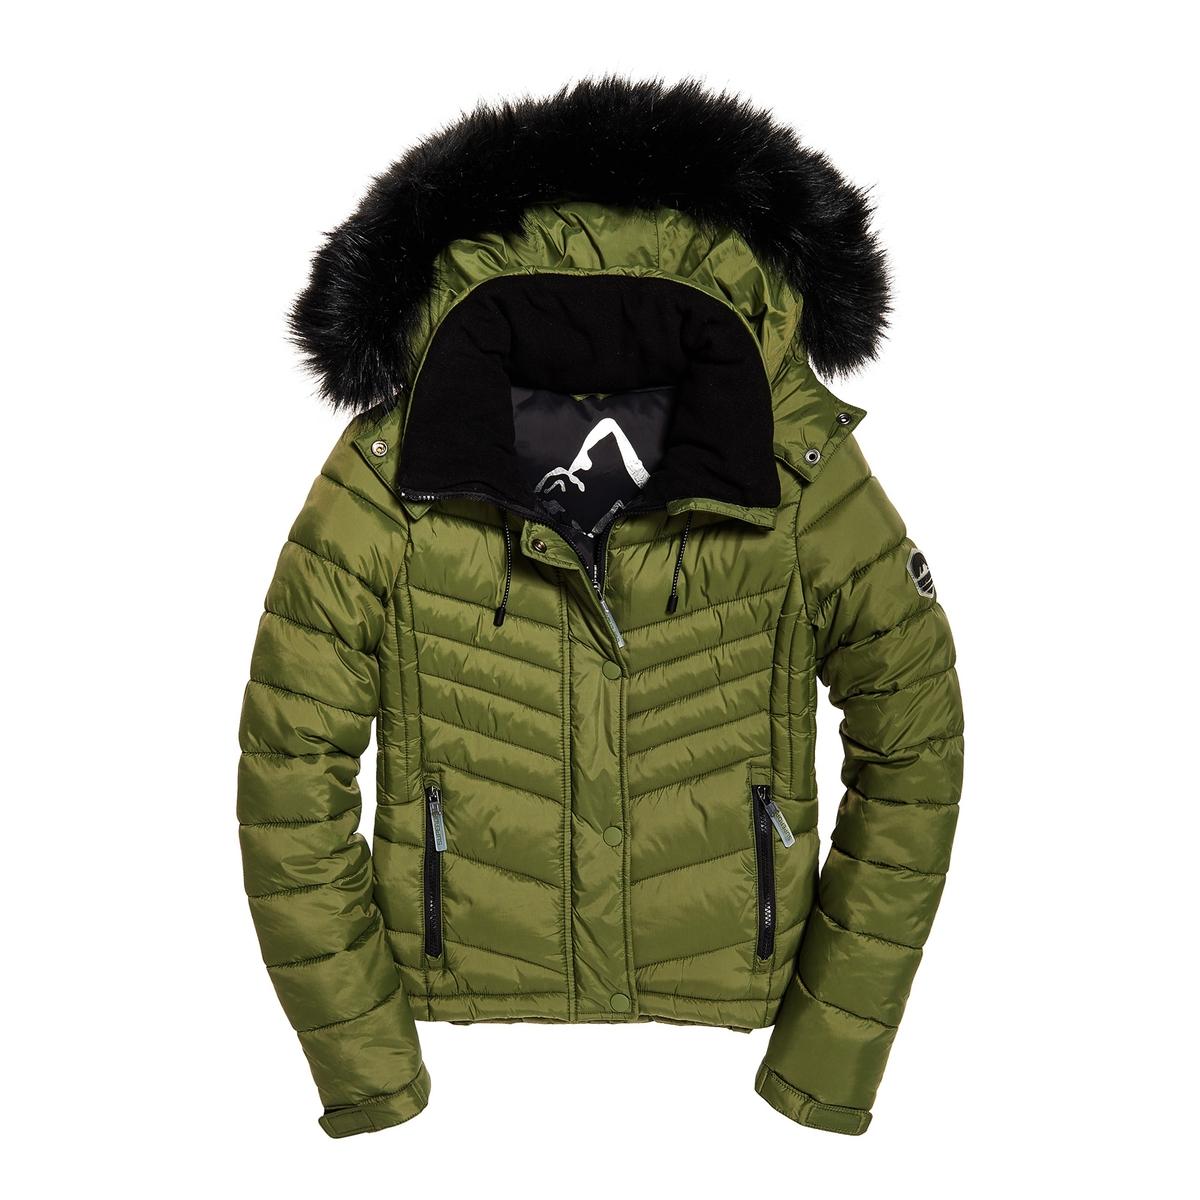 Chaqueta acolchada Fuji Slim 3 in 1 Jacket